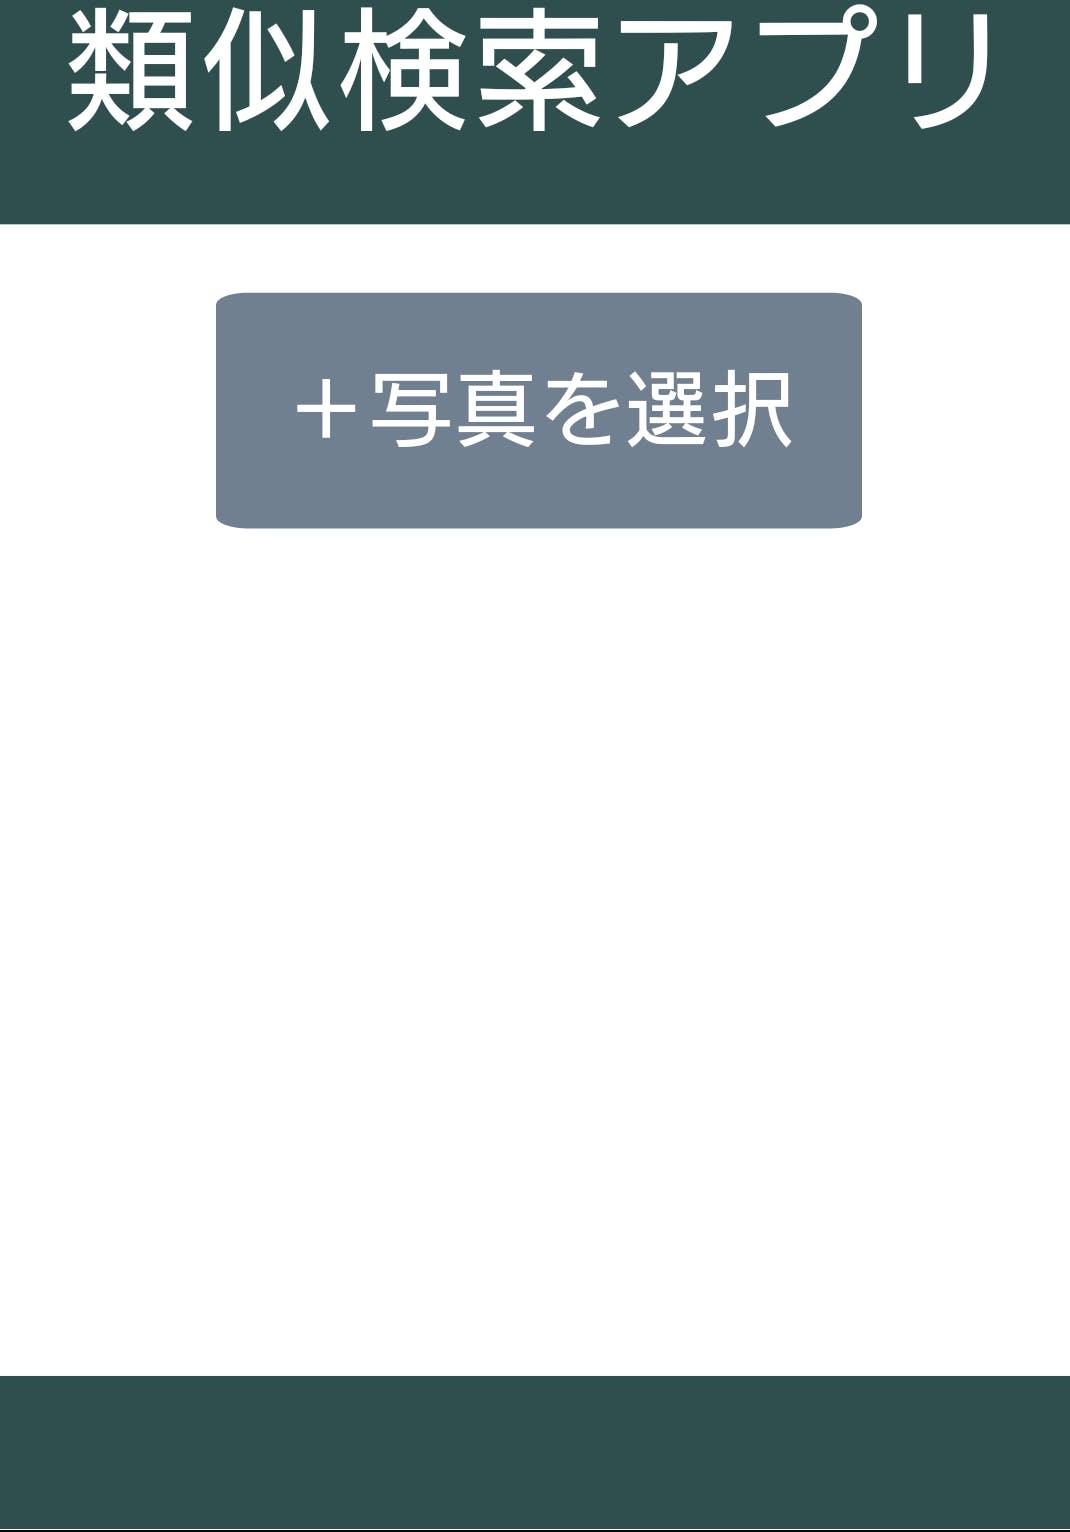 Screenshot_20170708-184234.png